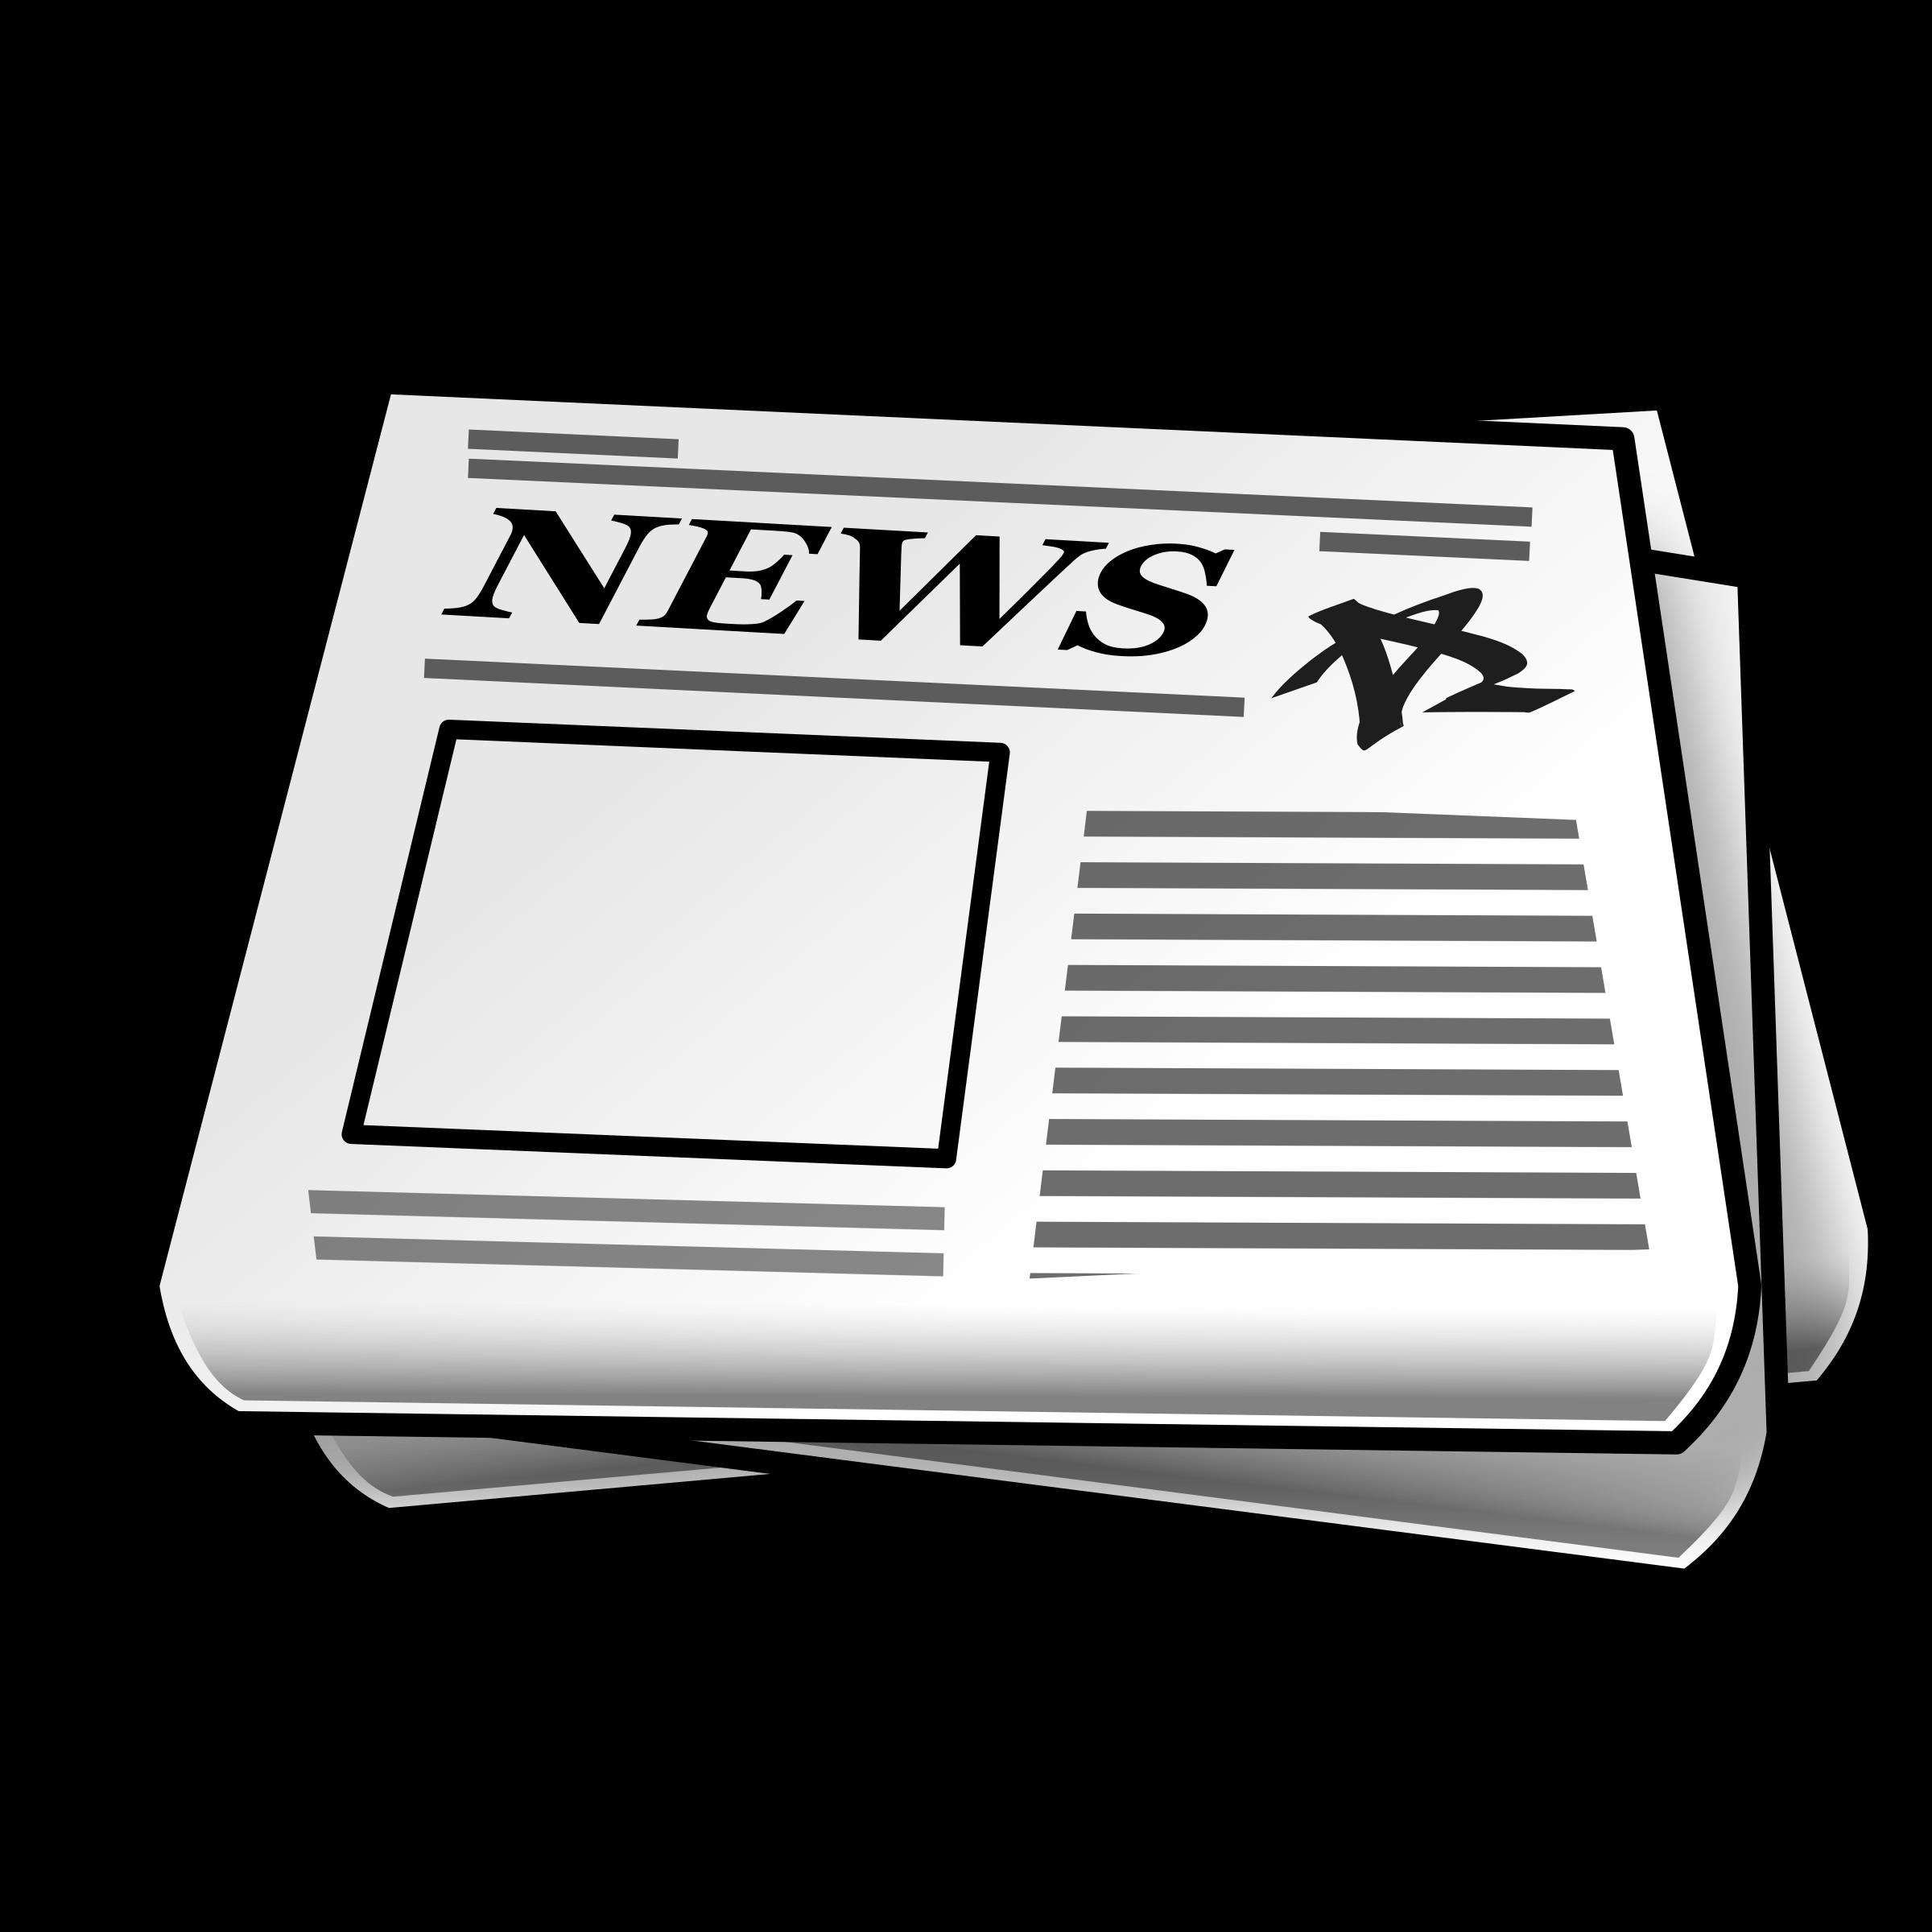 News clipart logo clipart freeuse Clipart - news | Clipart Panda - Free Clipart Images clipart freeuse